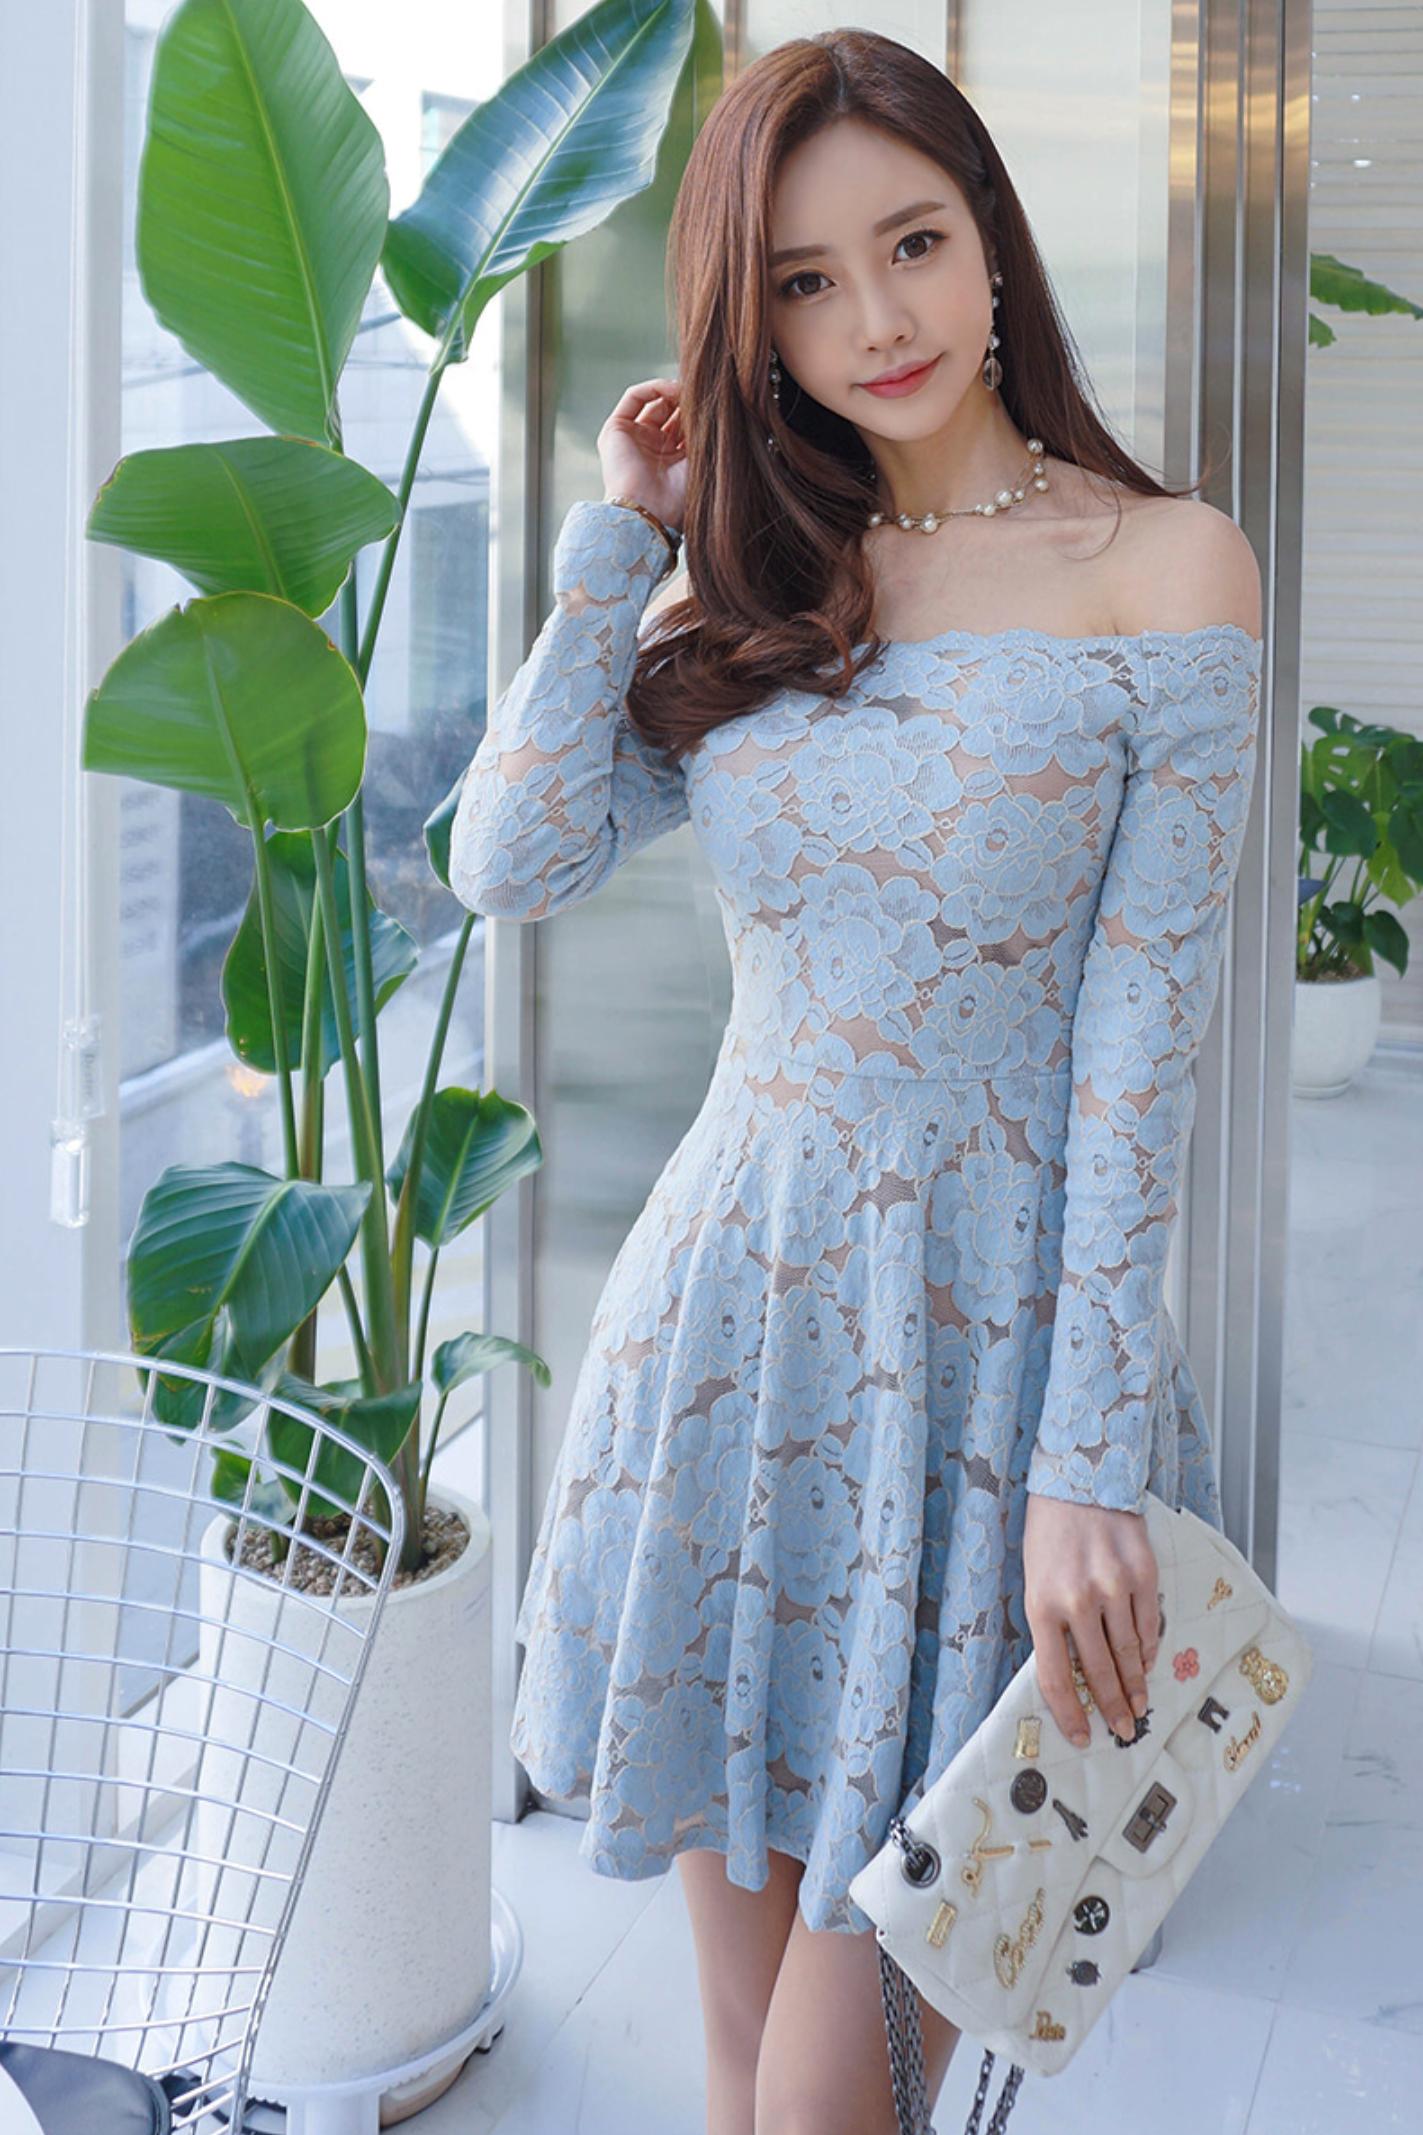 beautiful Korean woman